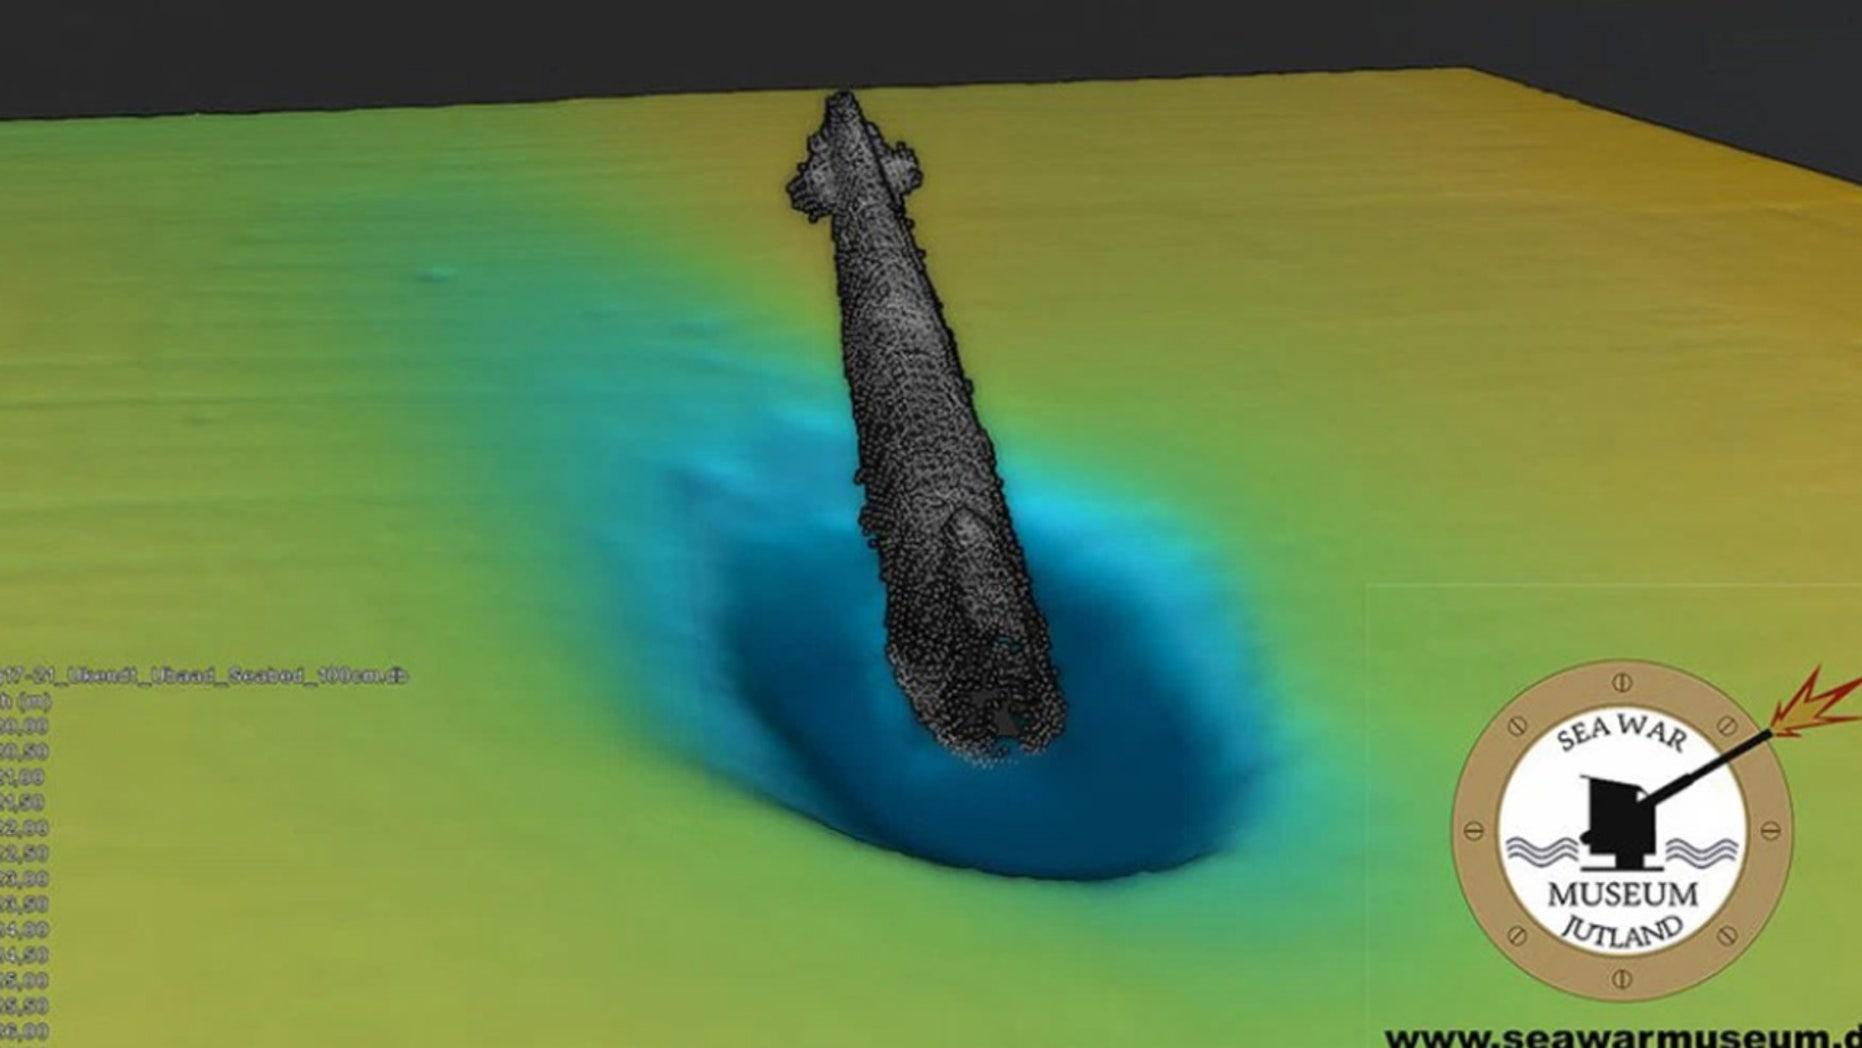 Denmark's Sea War Museum discovered the U-3523 roughly 403 feet below sea level.